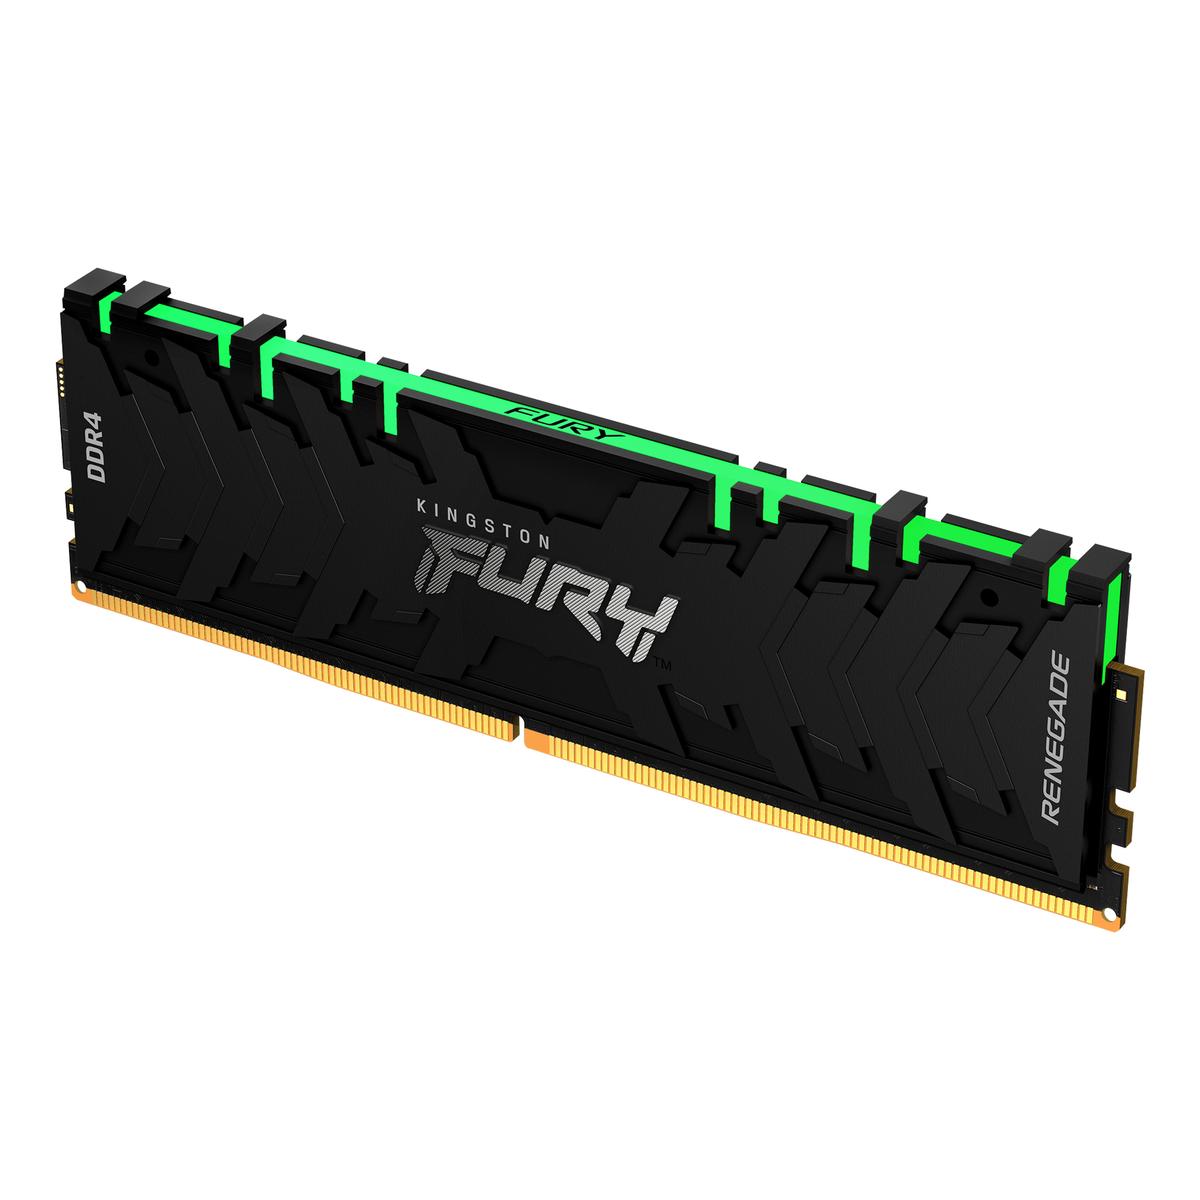 Kingston-Fury Kingston Fury Ddr4 Sdram 8 Gb 3600 Mhz Cl16